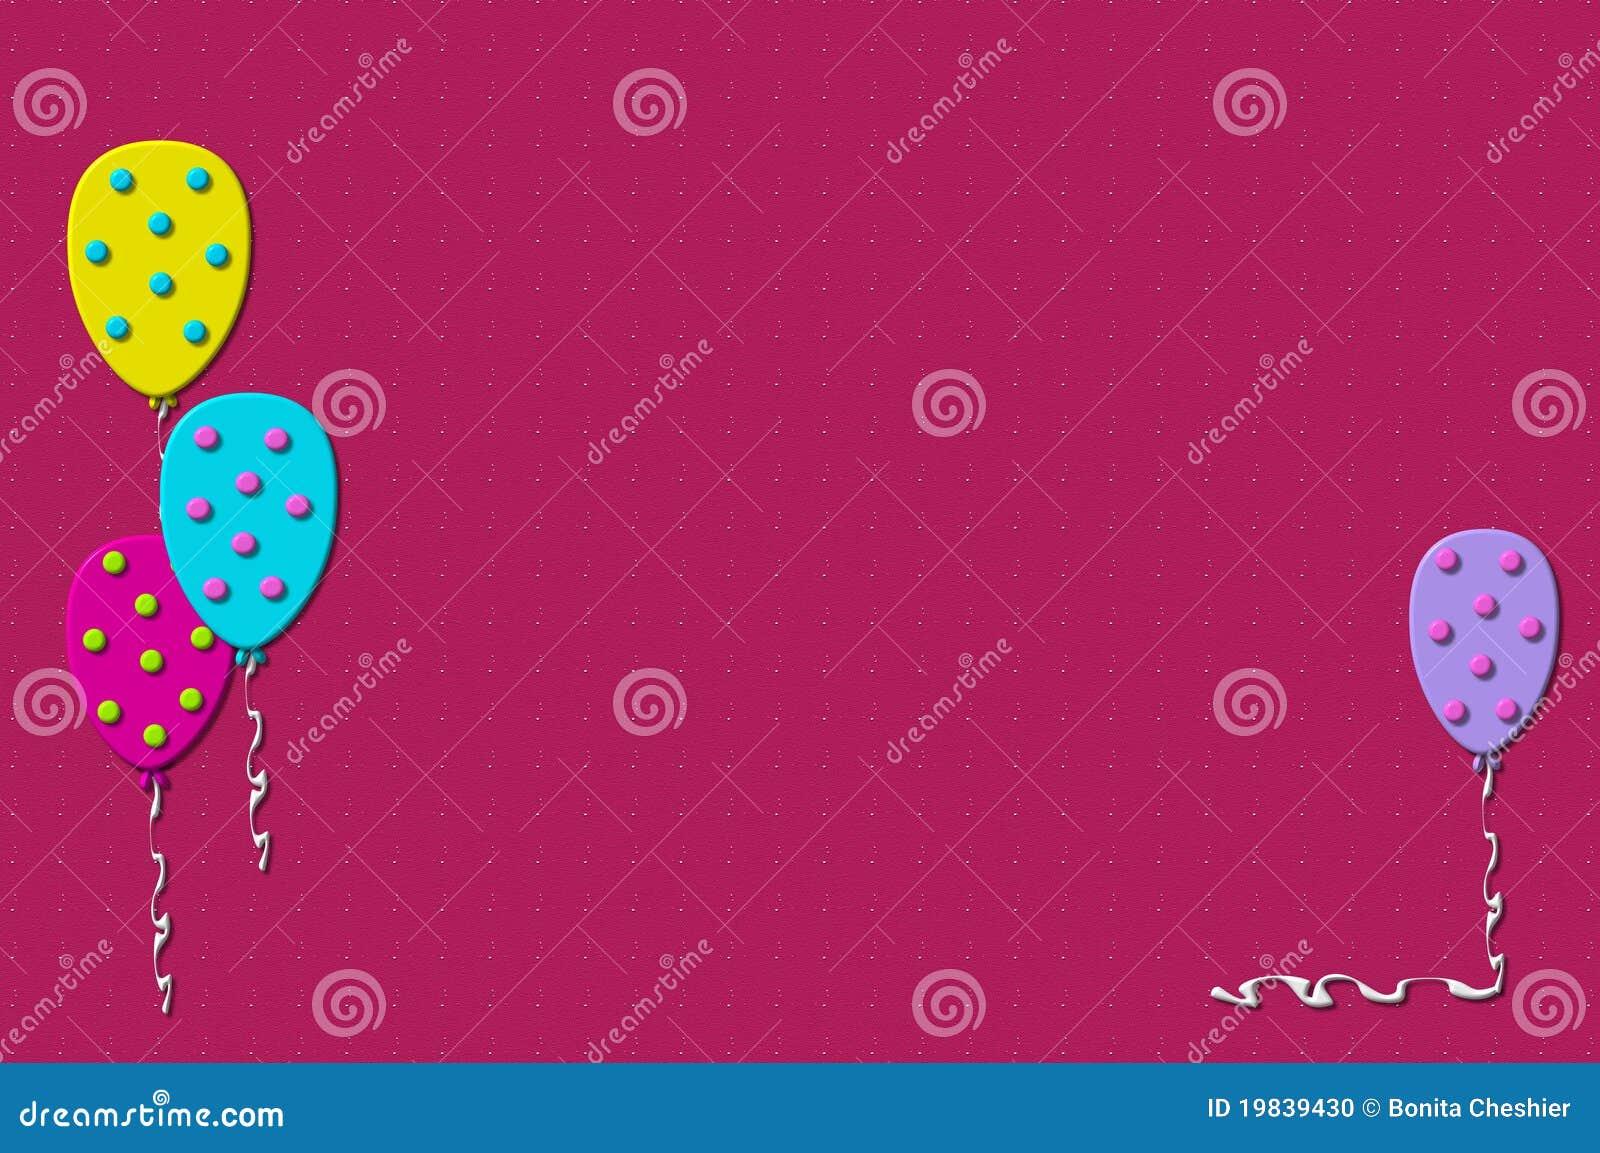 3D Balloons Pink